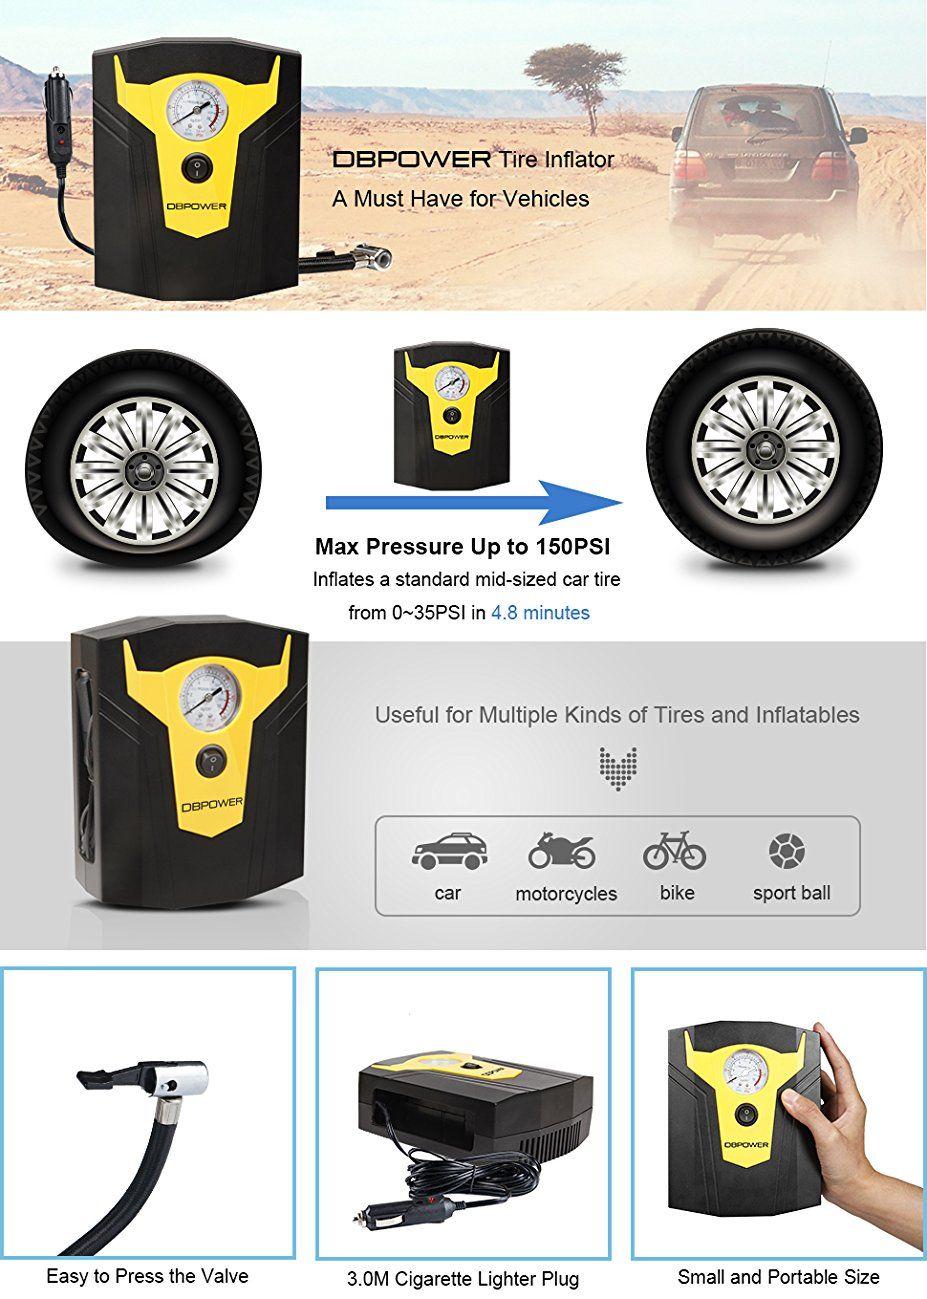 DBPOWER 12V DC Air Compressor Pump Digital Tire Inflator